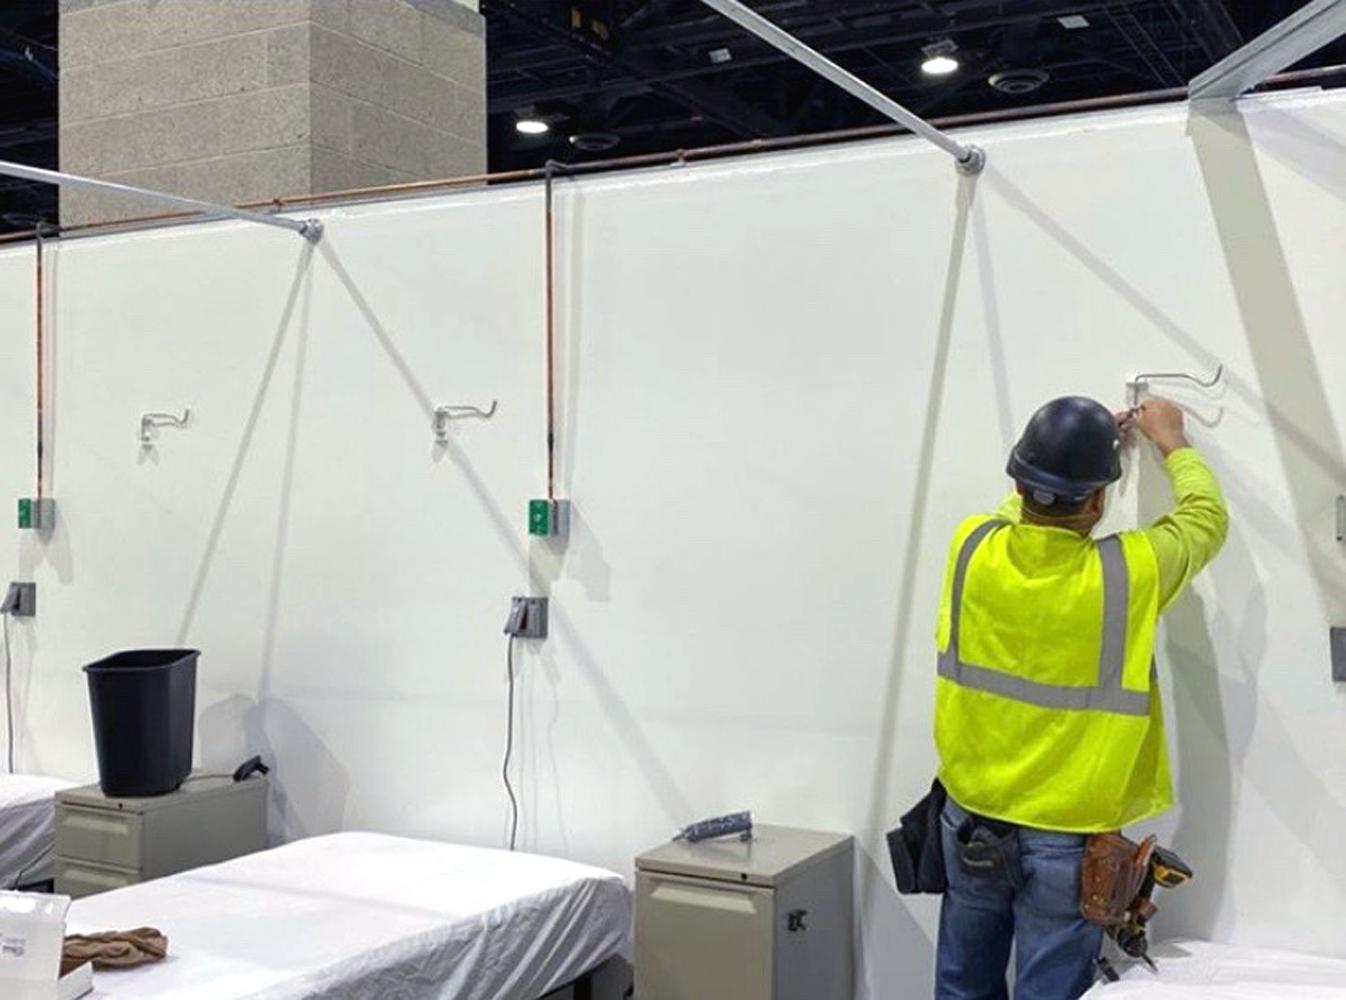 IV Hook Installation in Rhode Island Field Hospital